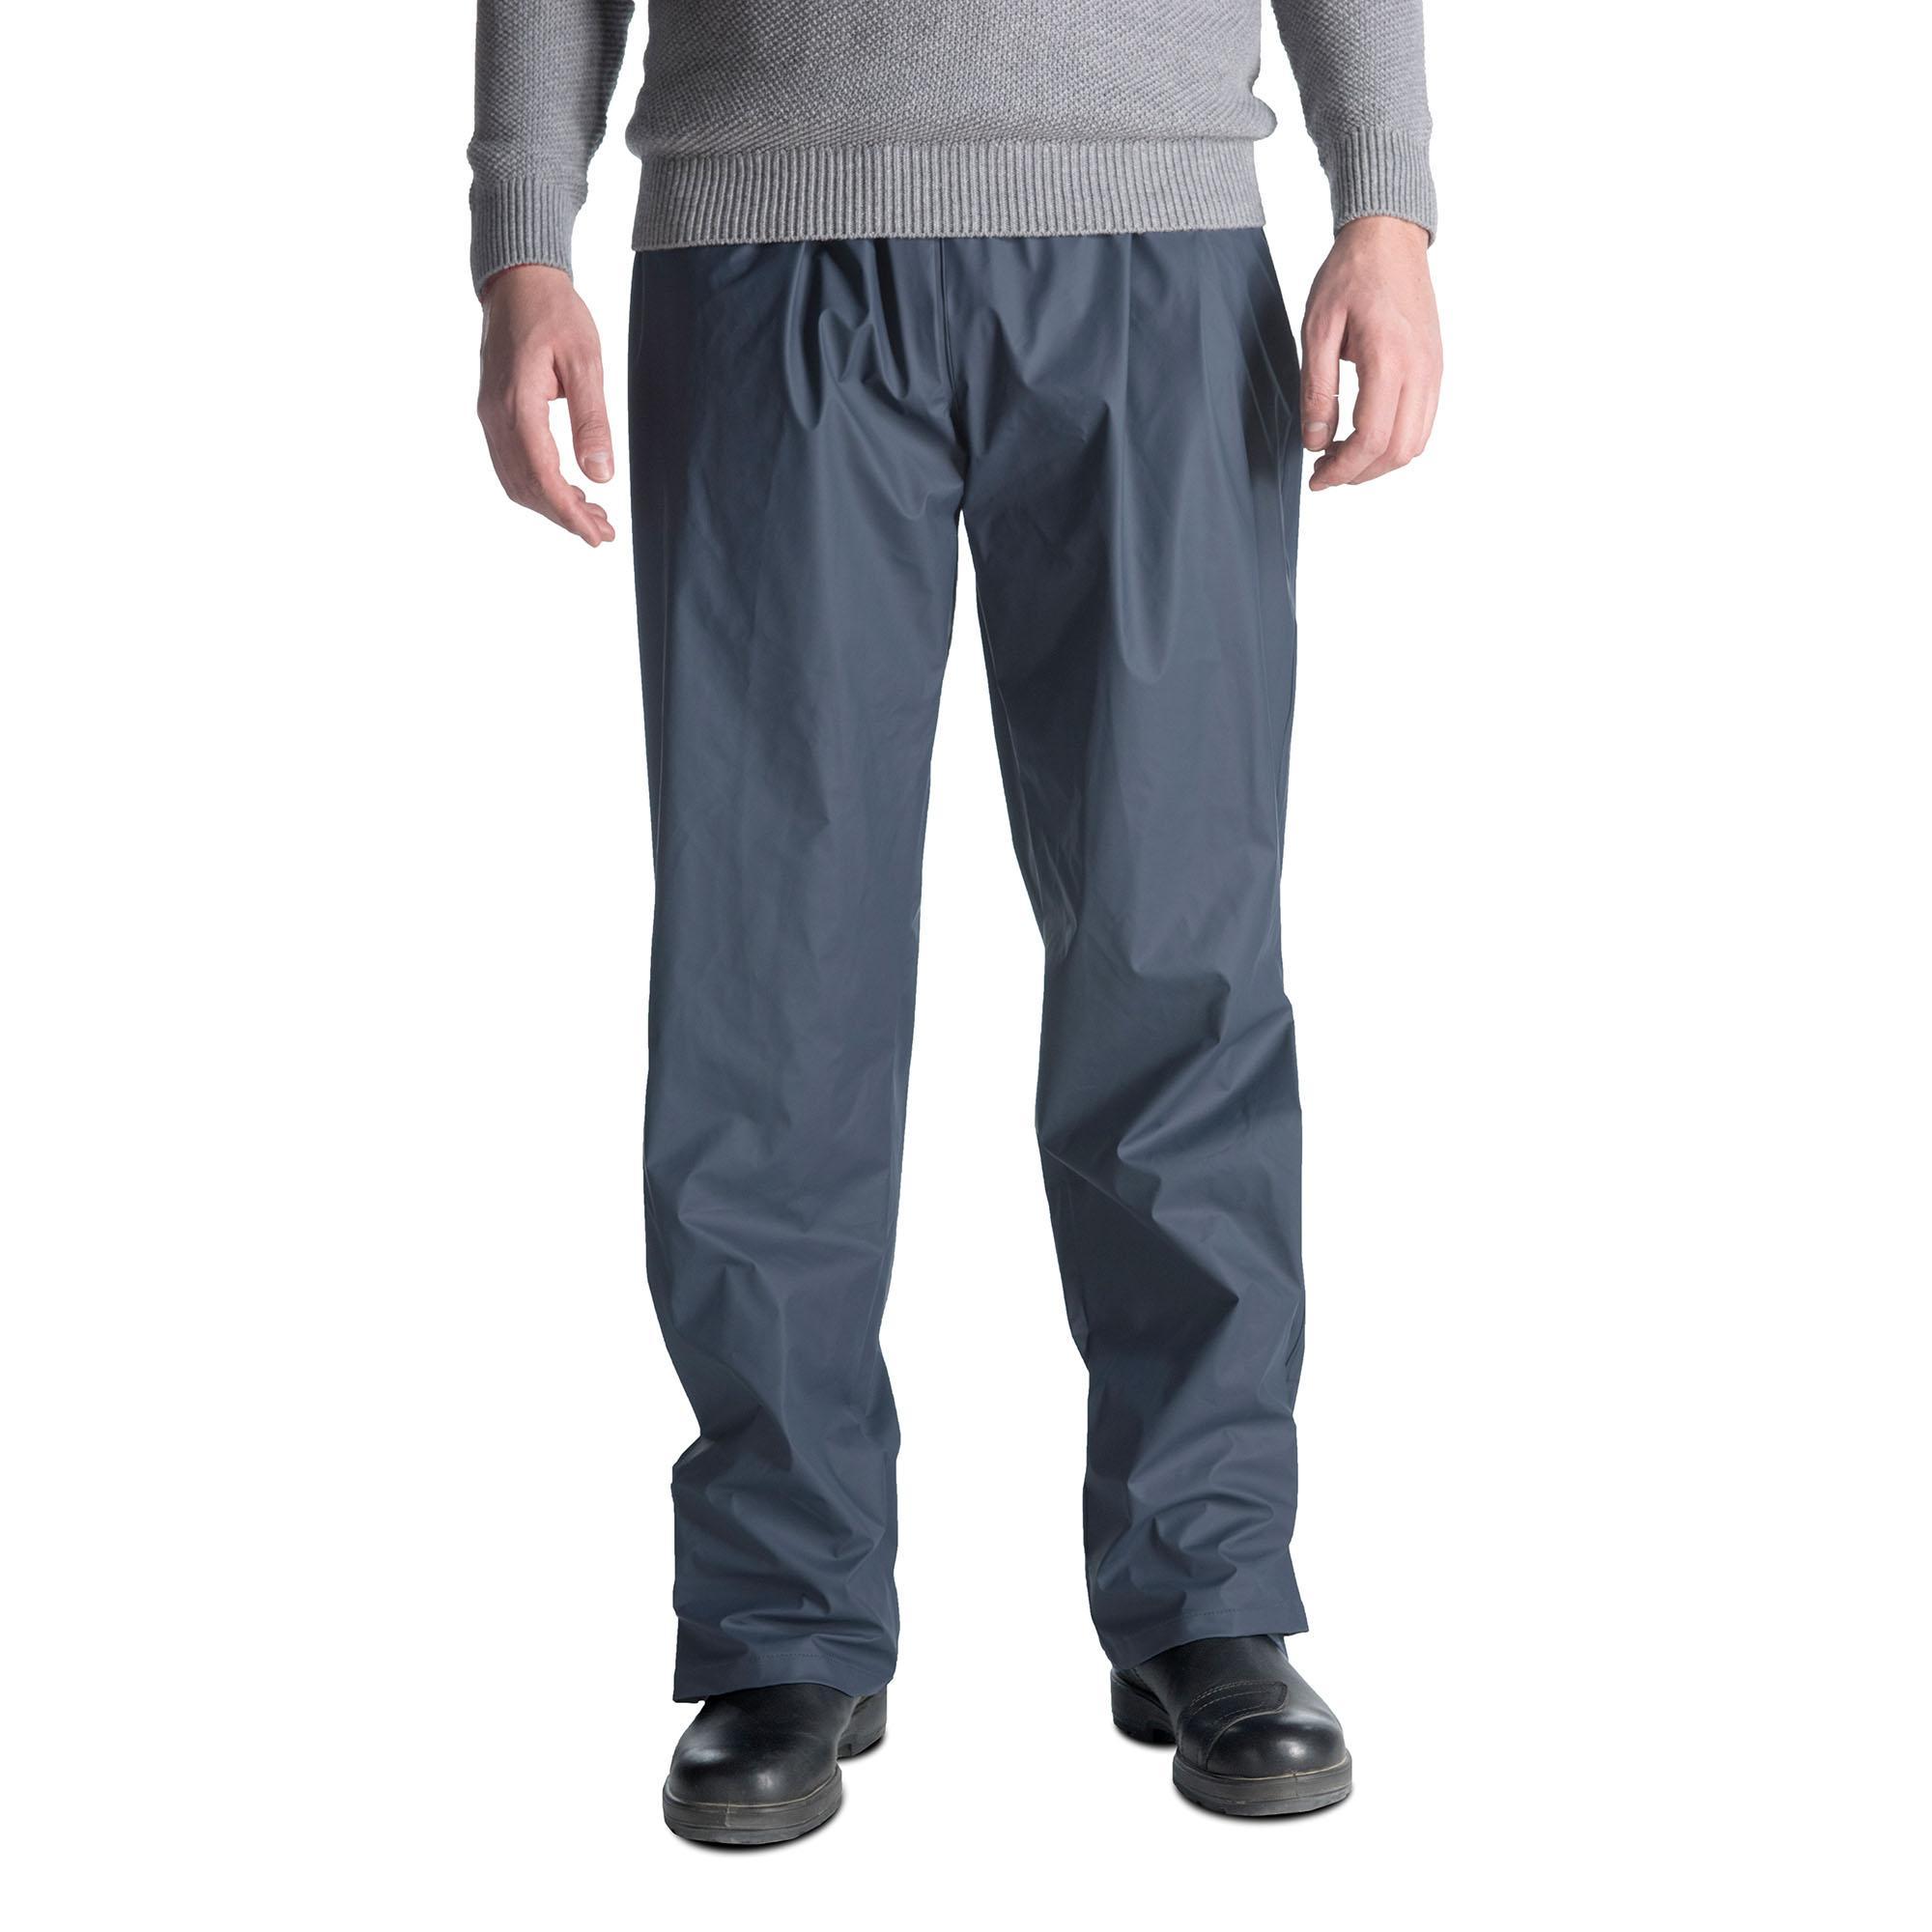 Pantaloni Pantapluvia Blu Scuro